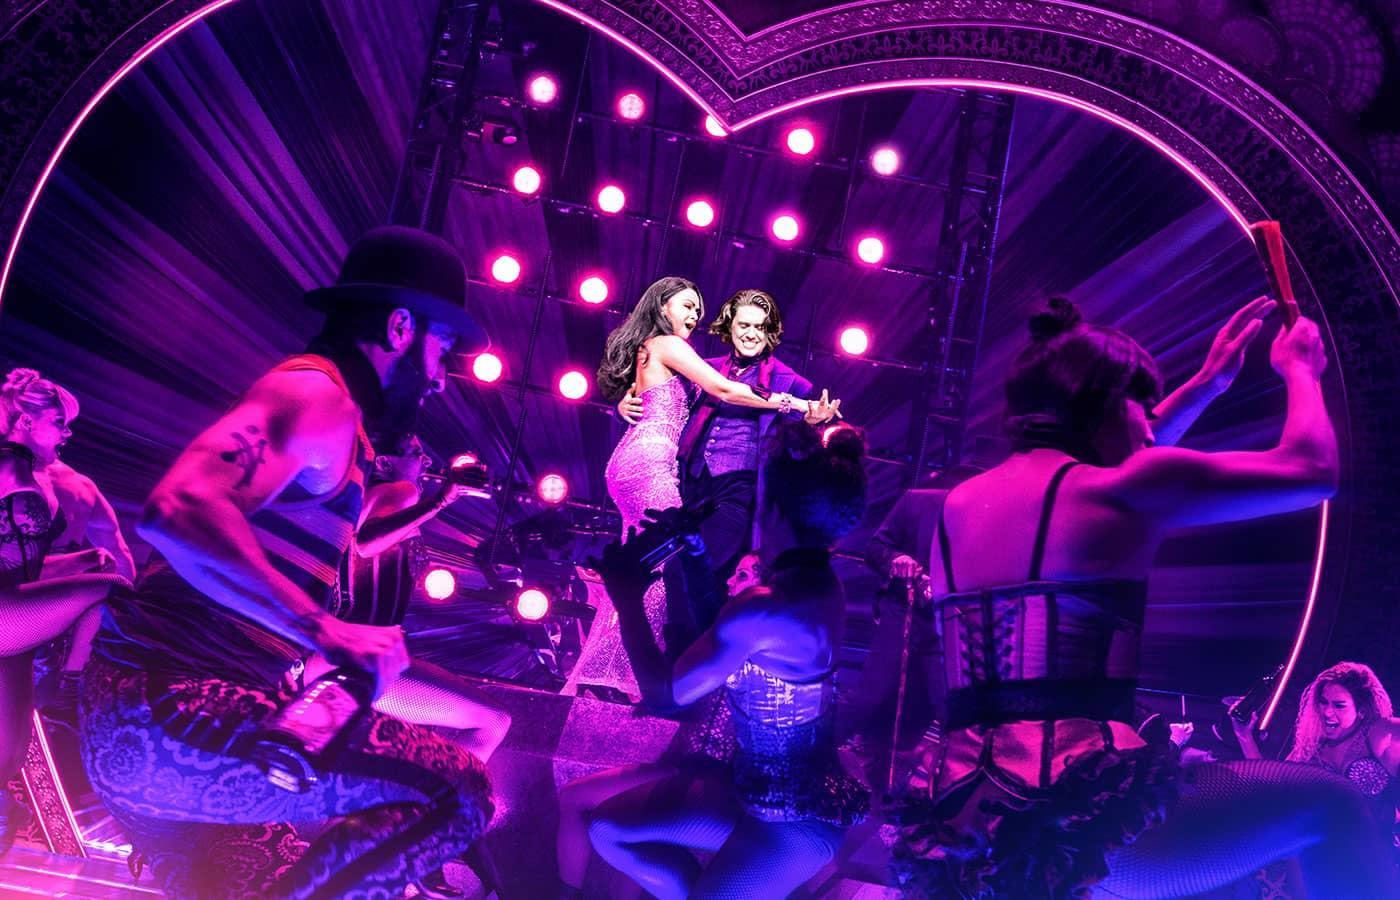 Moulin Rouge! The Musical op Broadway Tickets - De Moulin Rouge